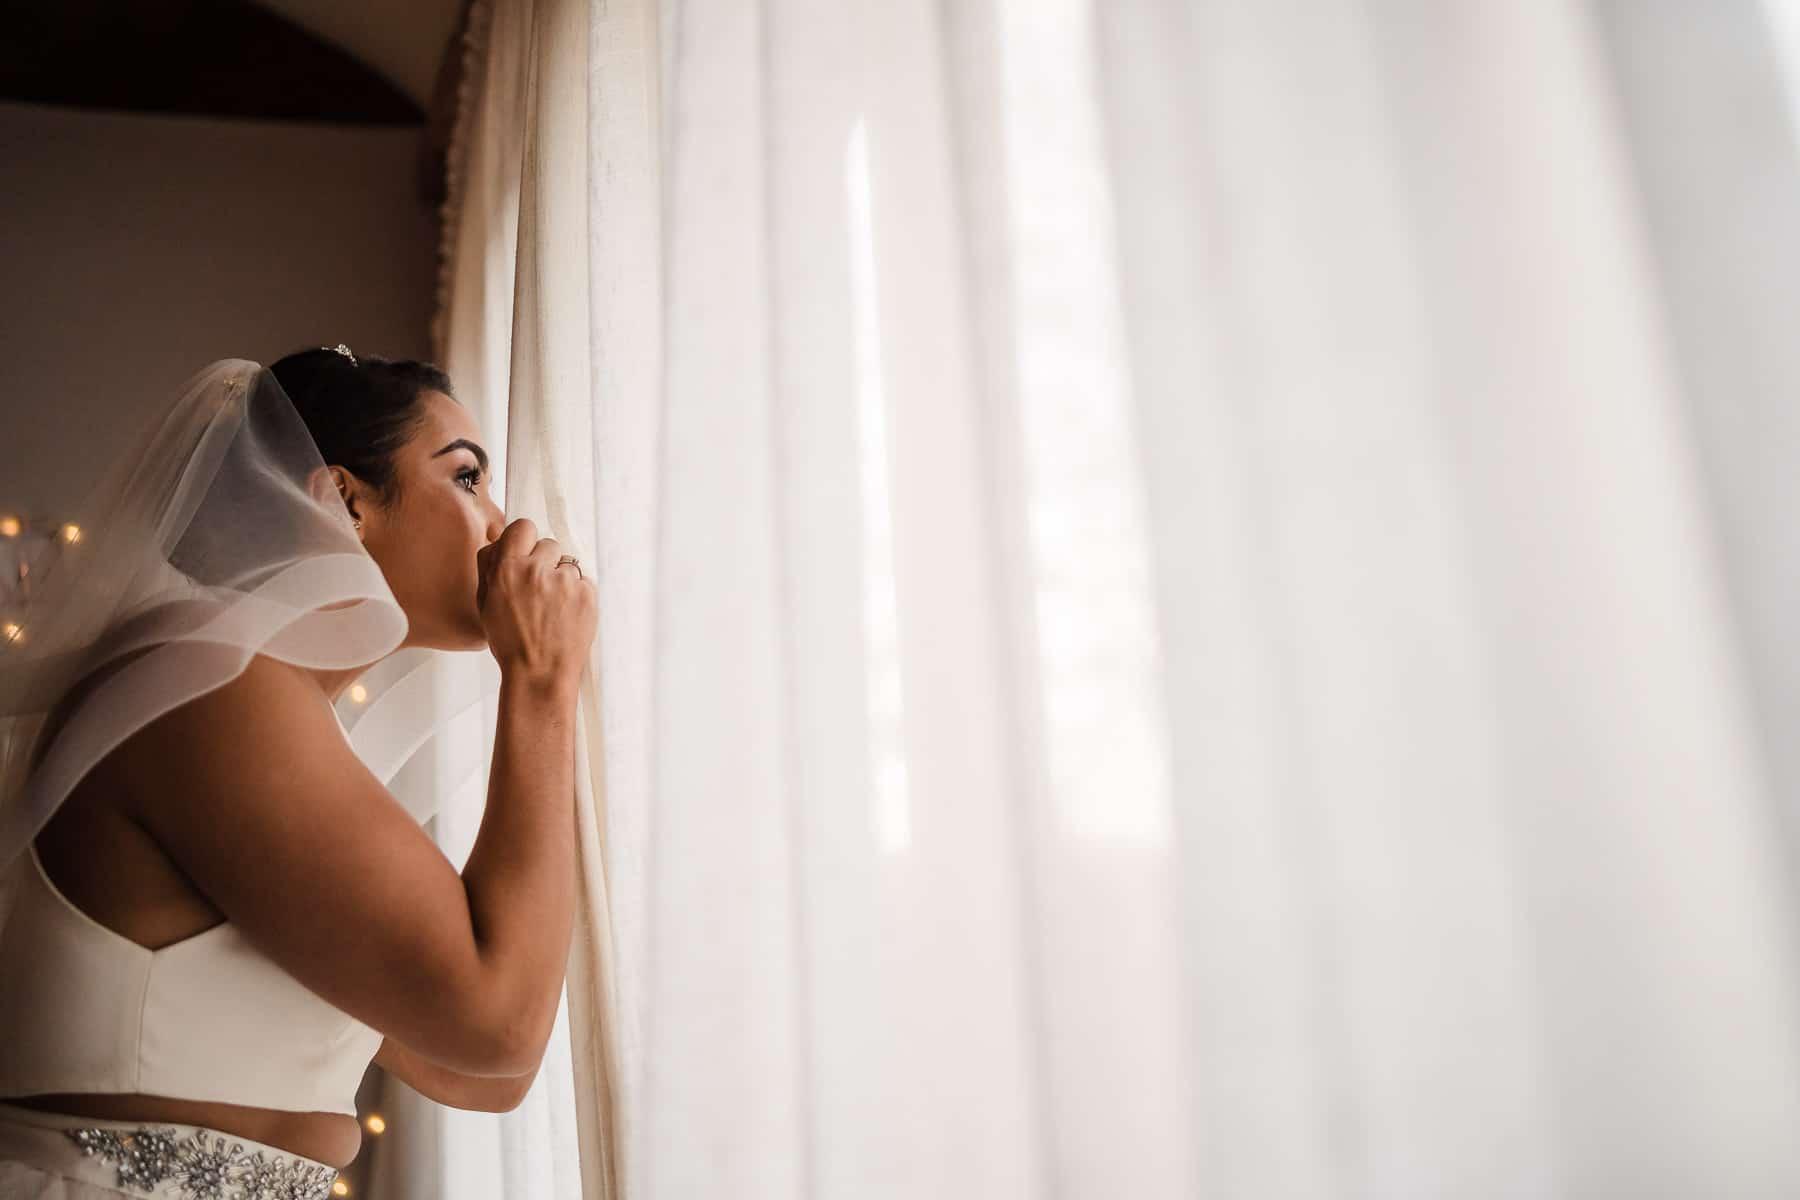 bride taking a sneak peek at her groom through the curtains